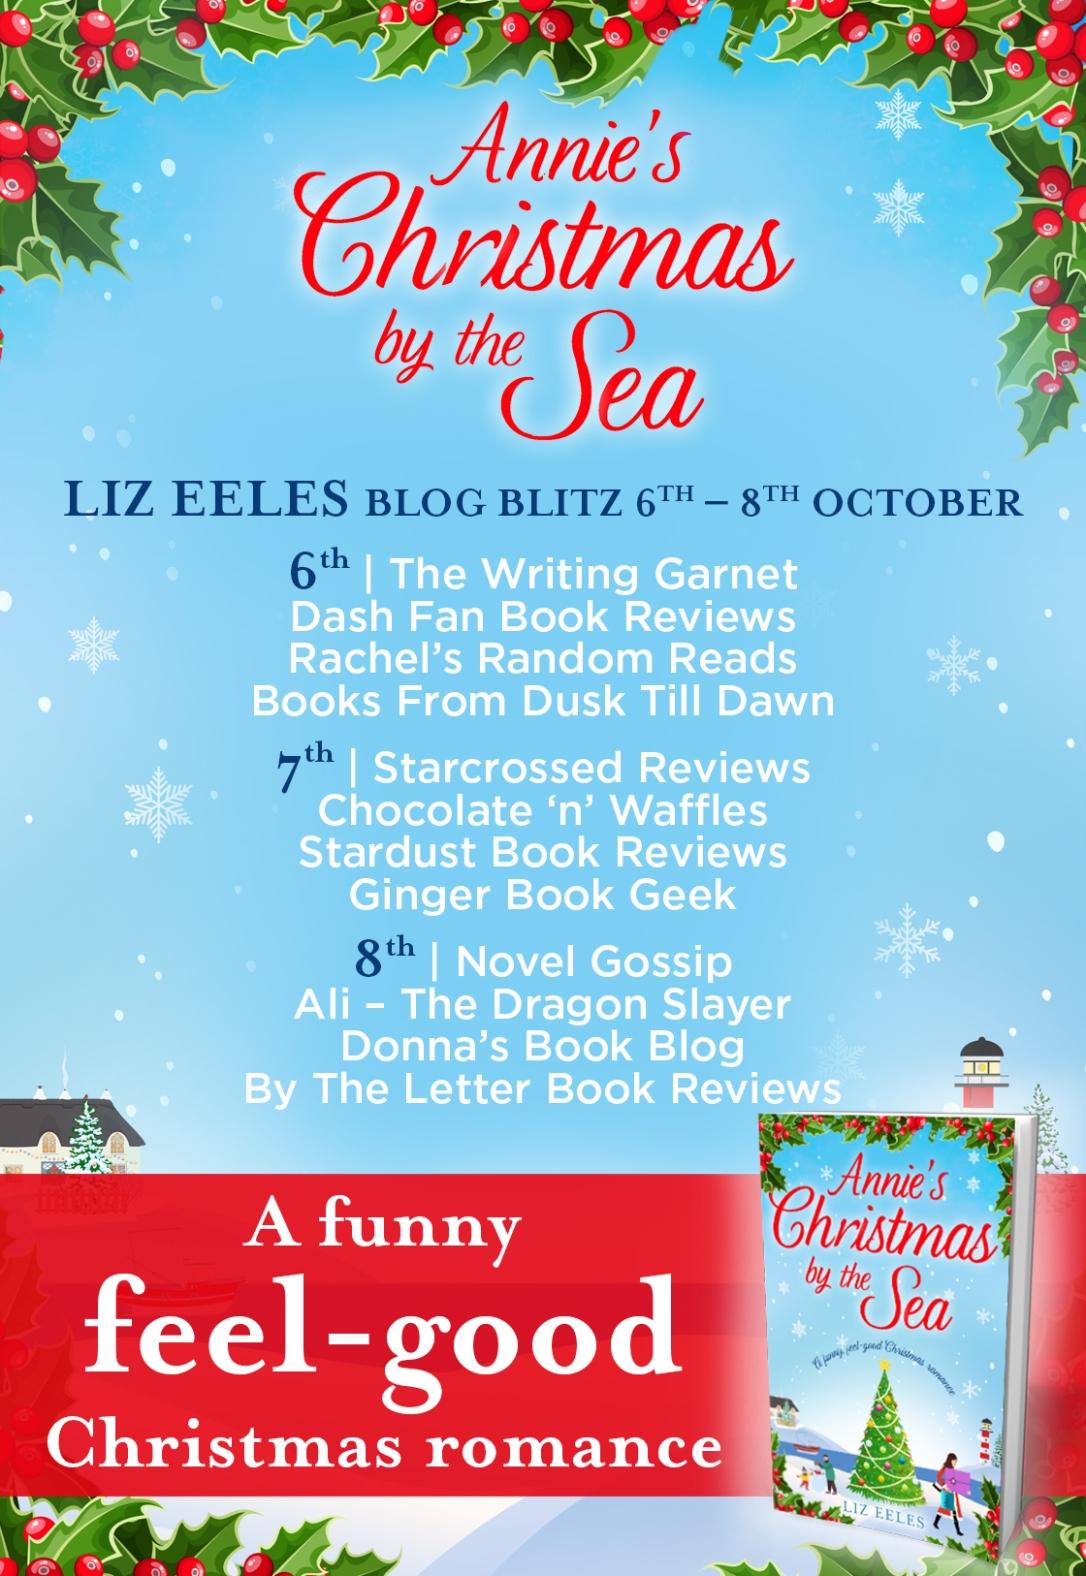 Annie's Christmas by the Sea - Blog Blitz.jpg